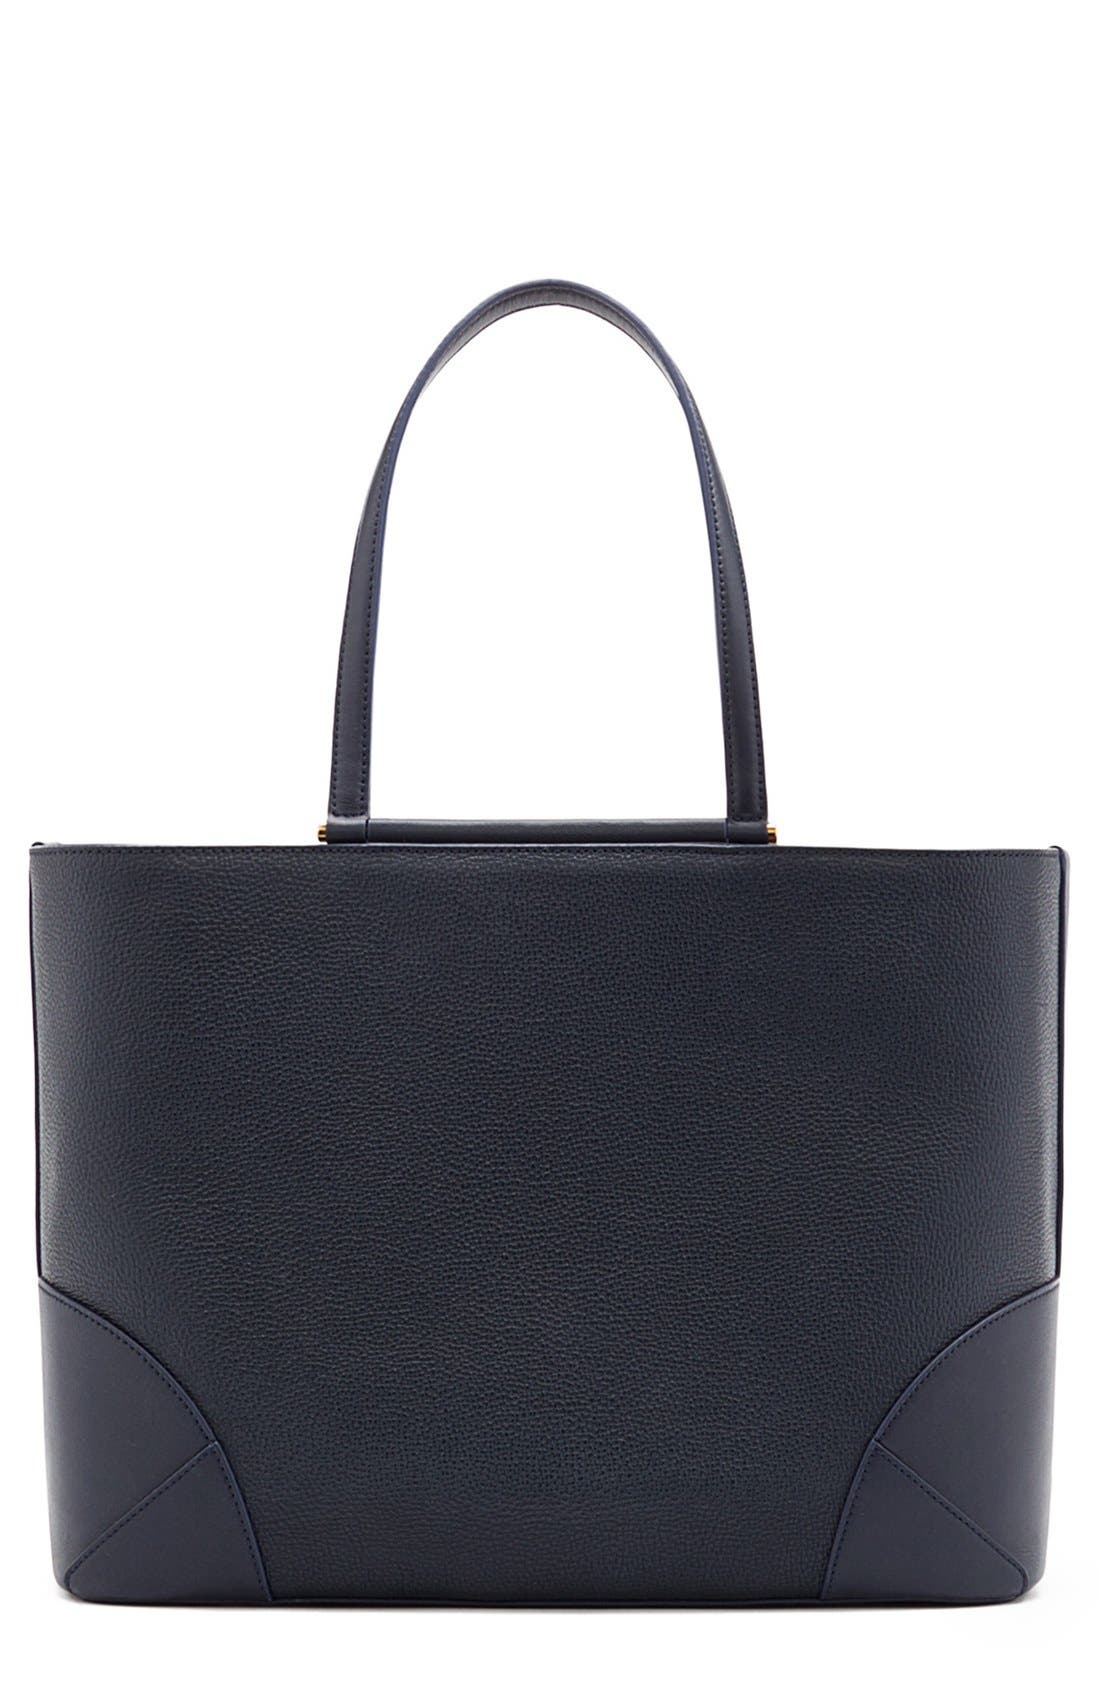 Alternate Image 1 Selected - MCM 'Medium Claudia' Leather Shopper